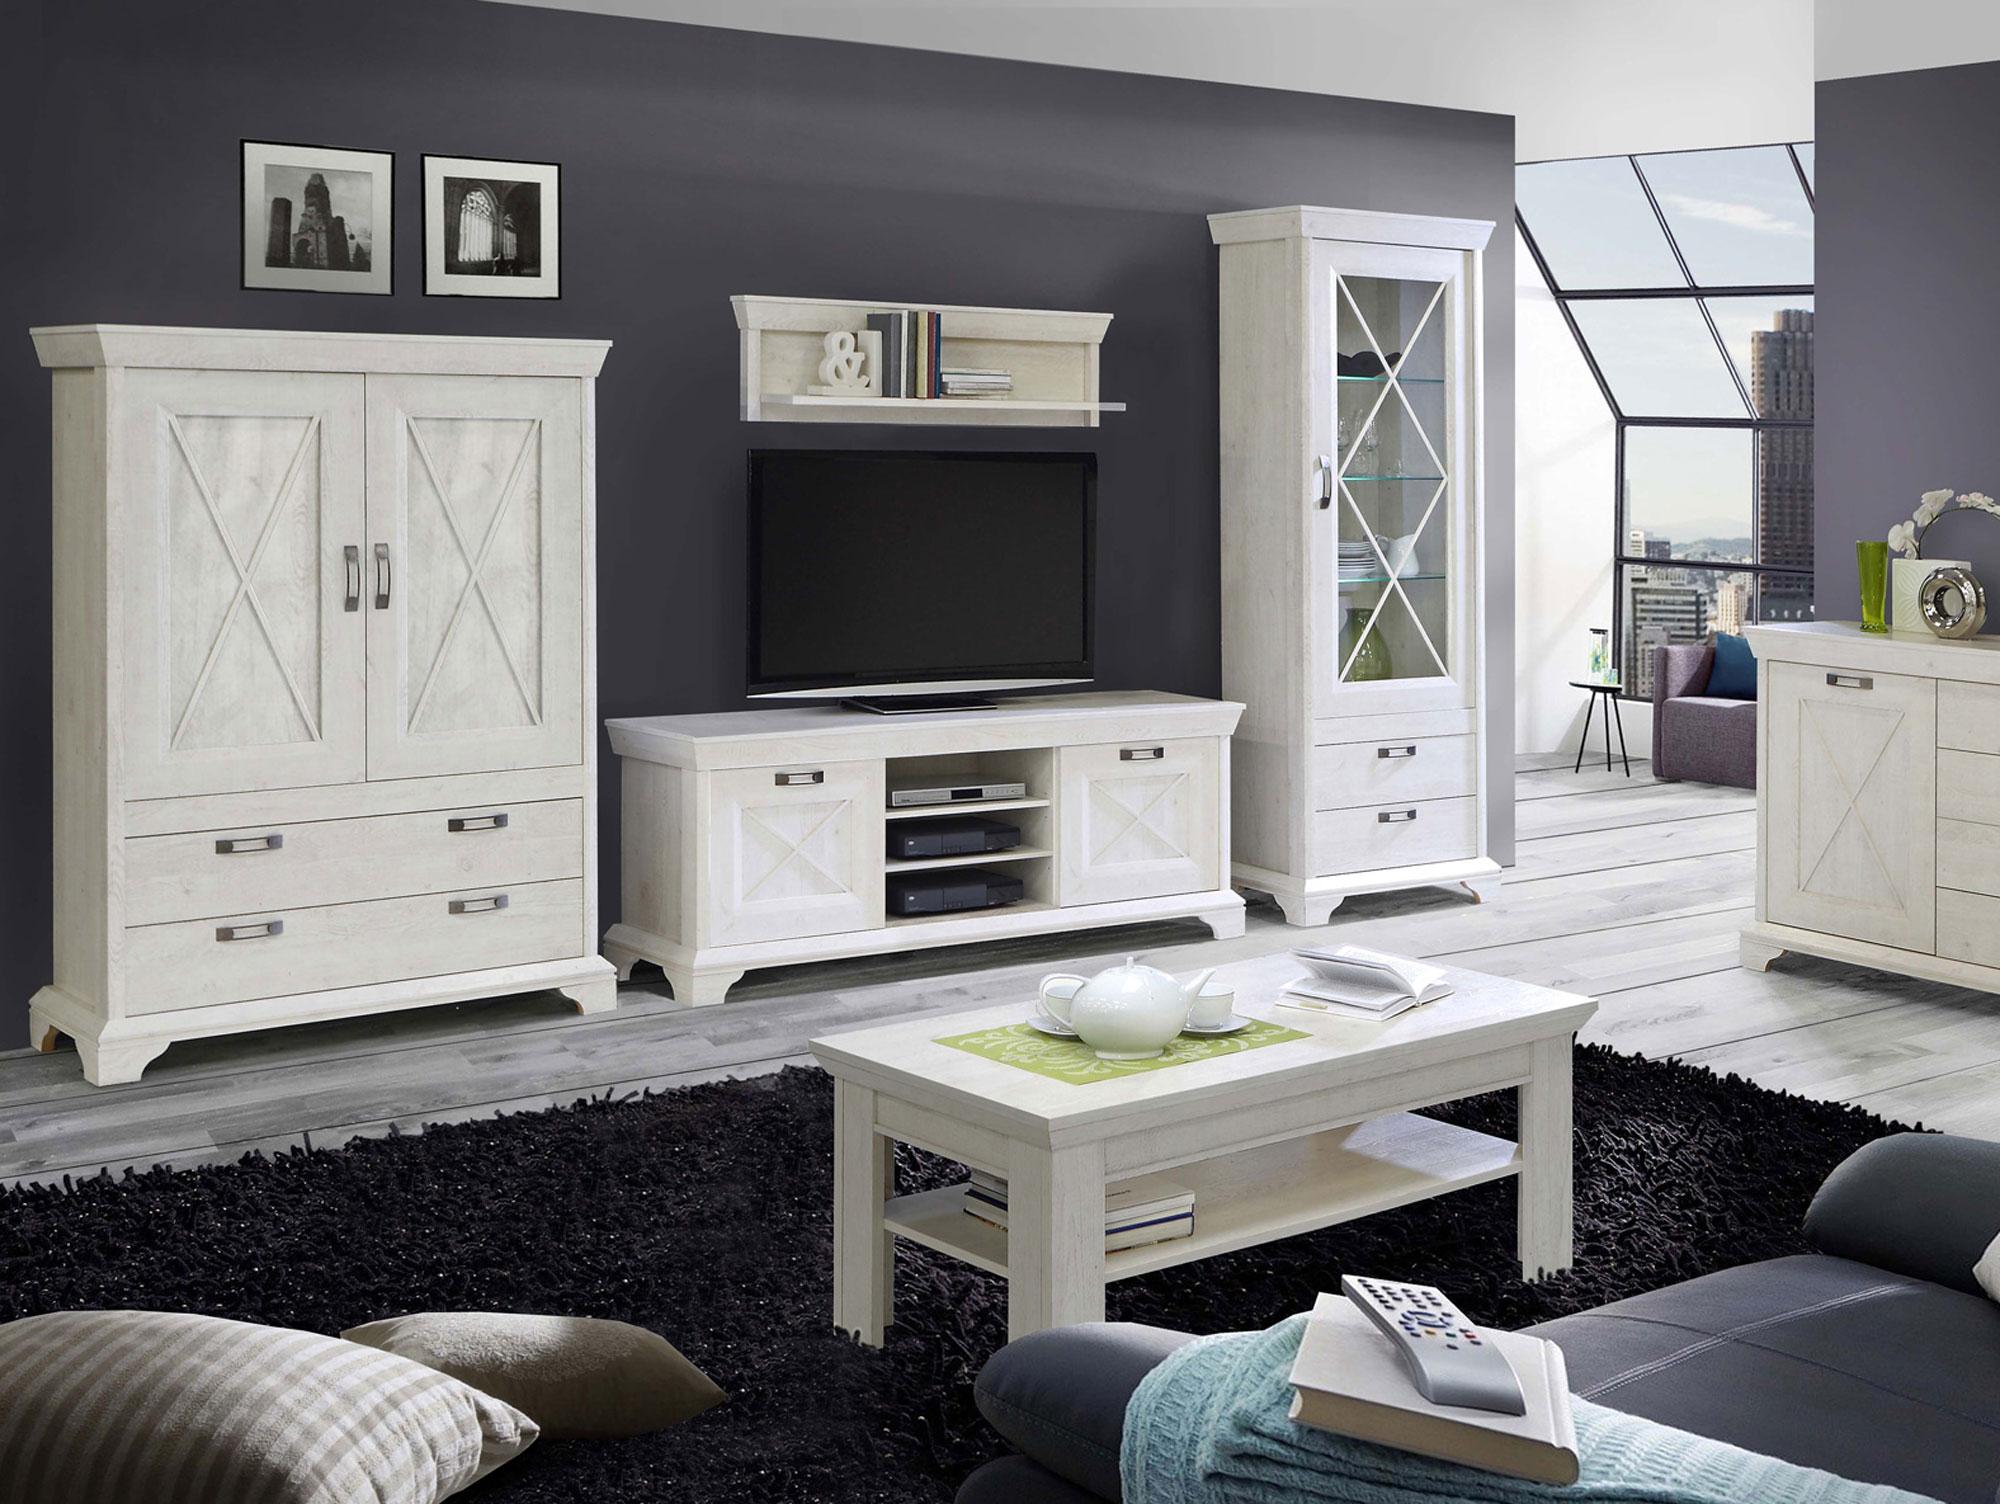 wohnwand kasha pinie weiss. Black Bedroom Furniture Sets. Home Design Ideas